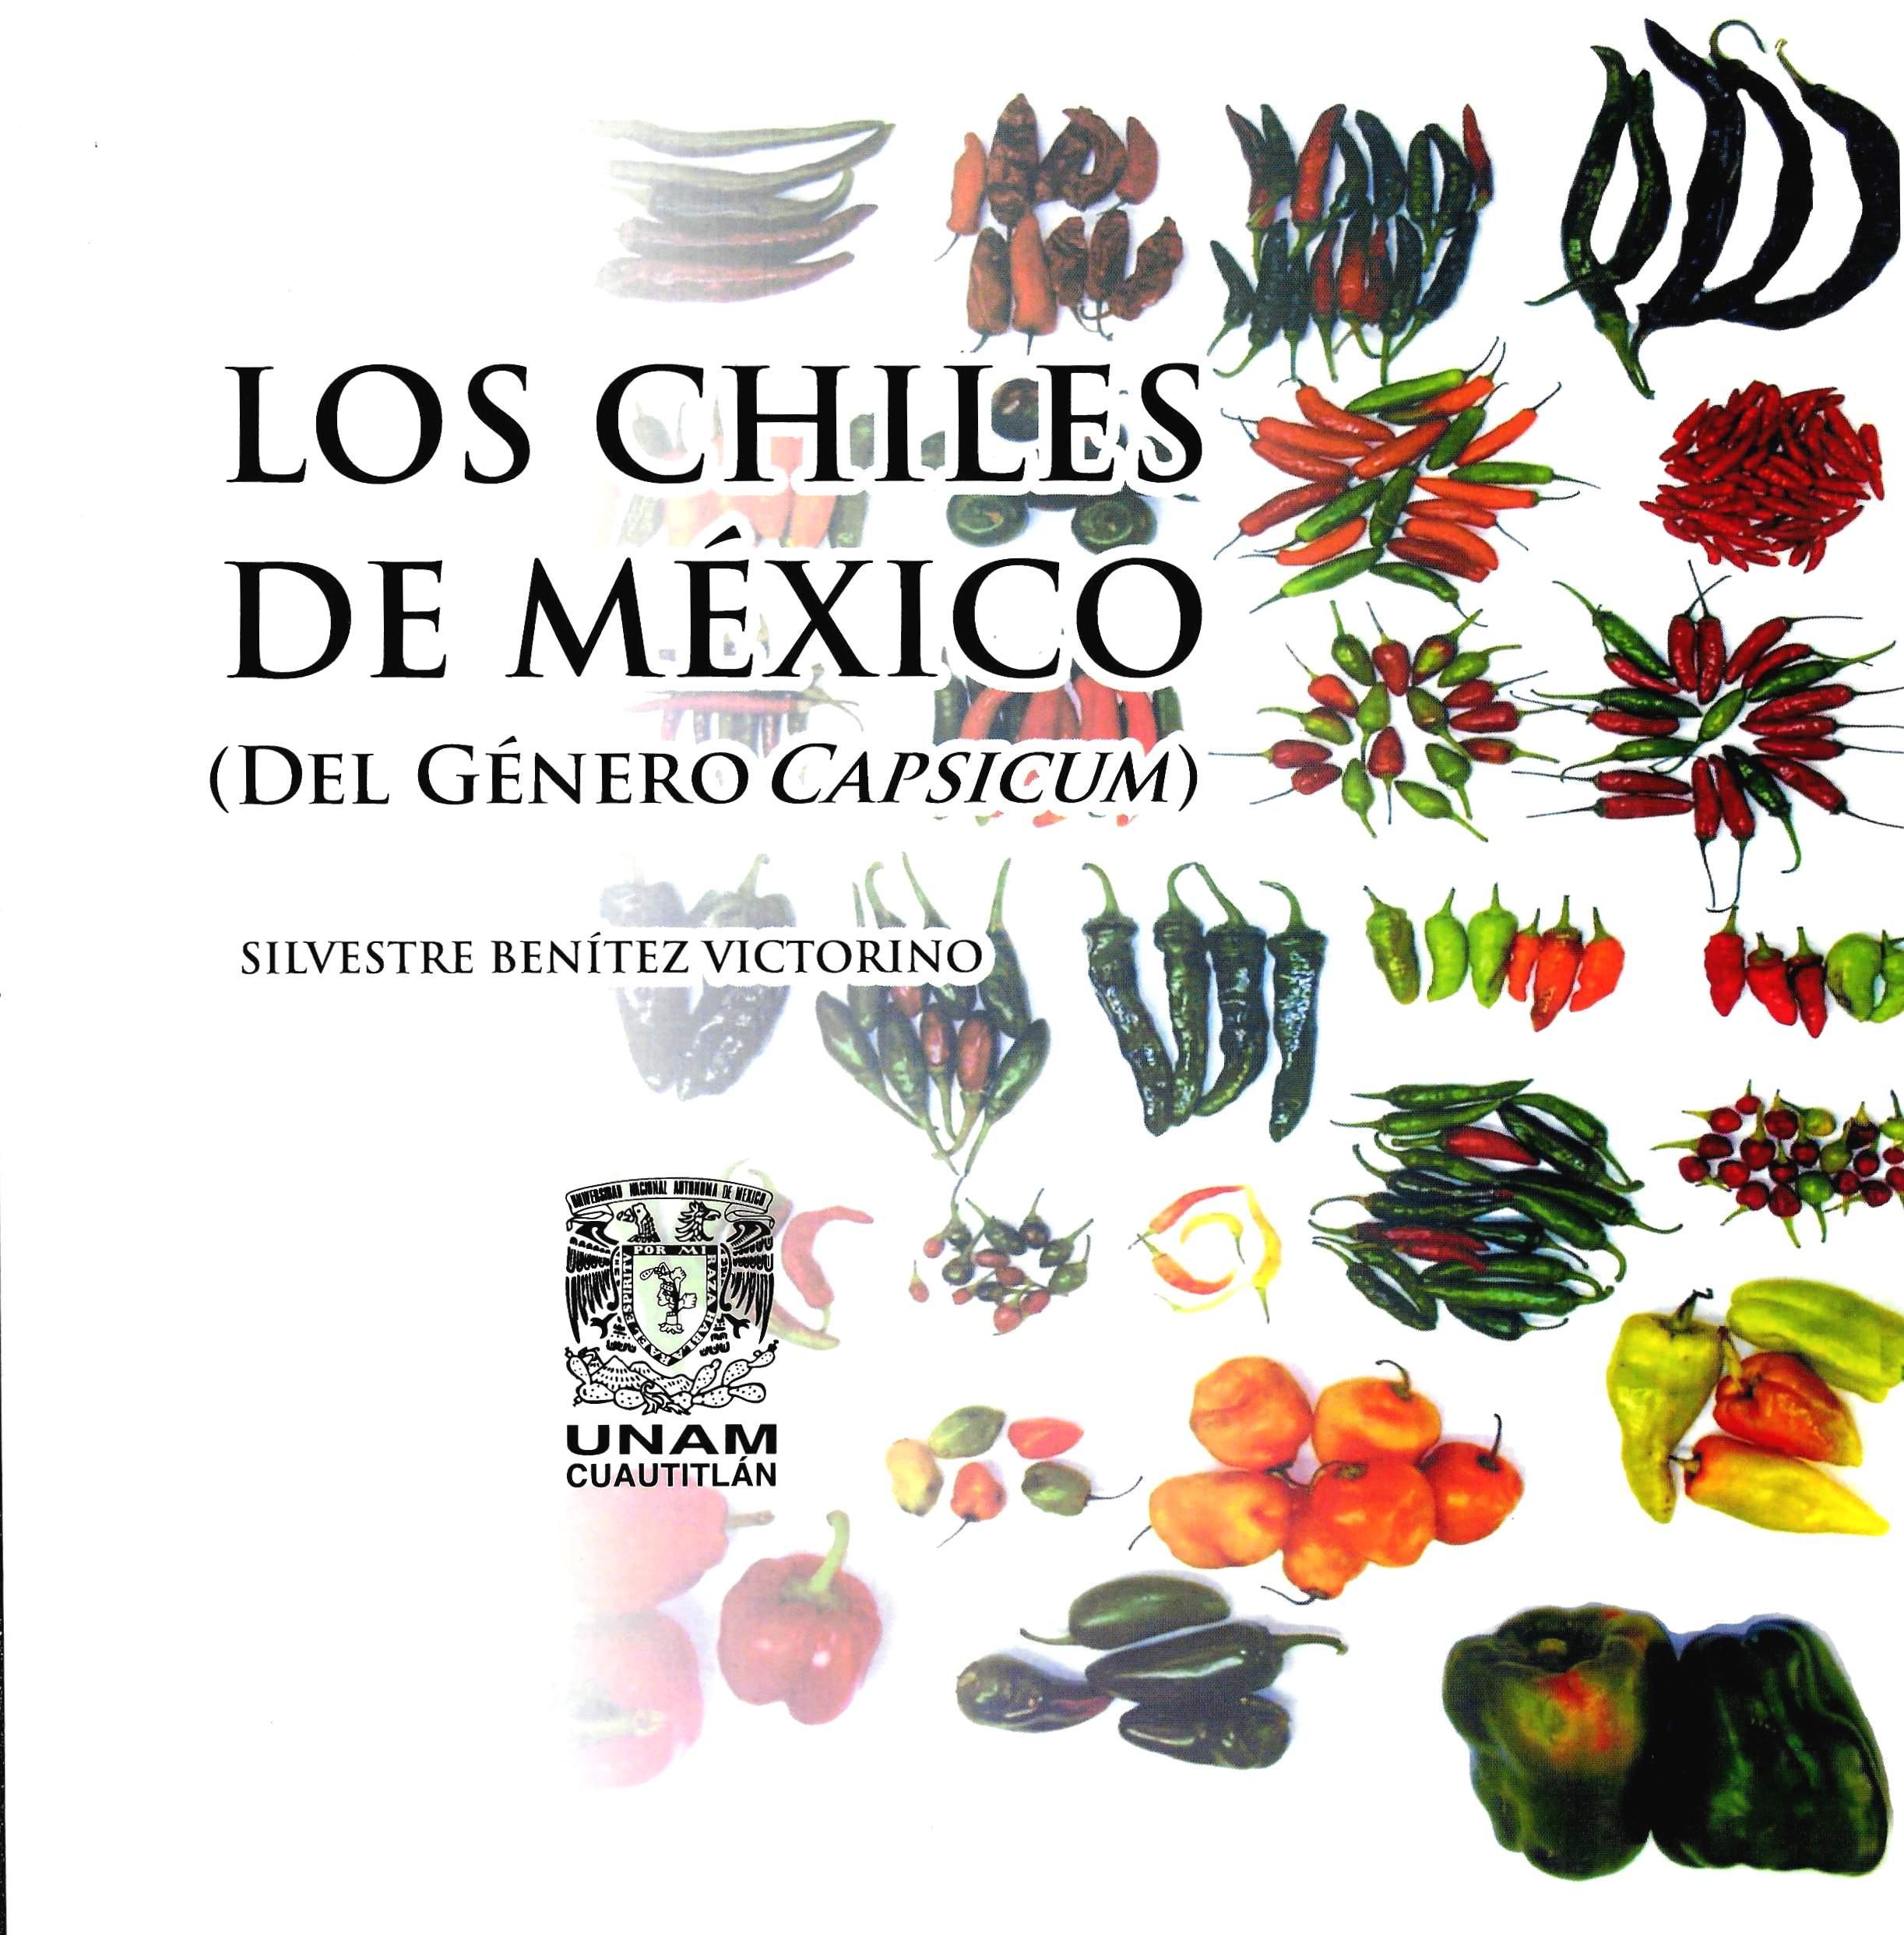 Los chiles de México (Del género Campsicum)